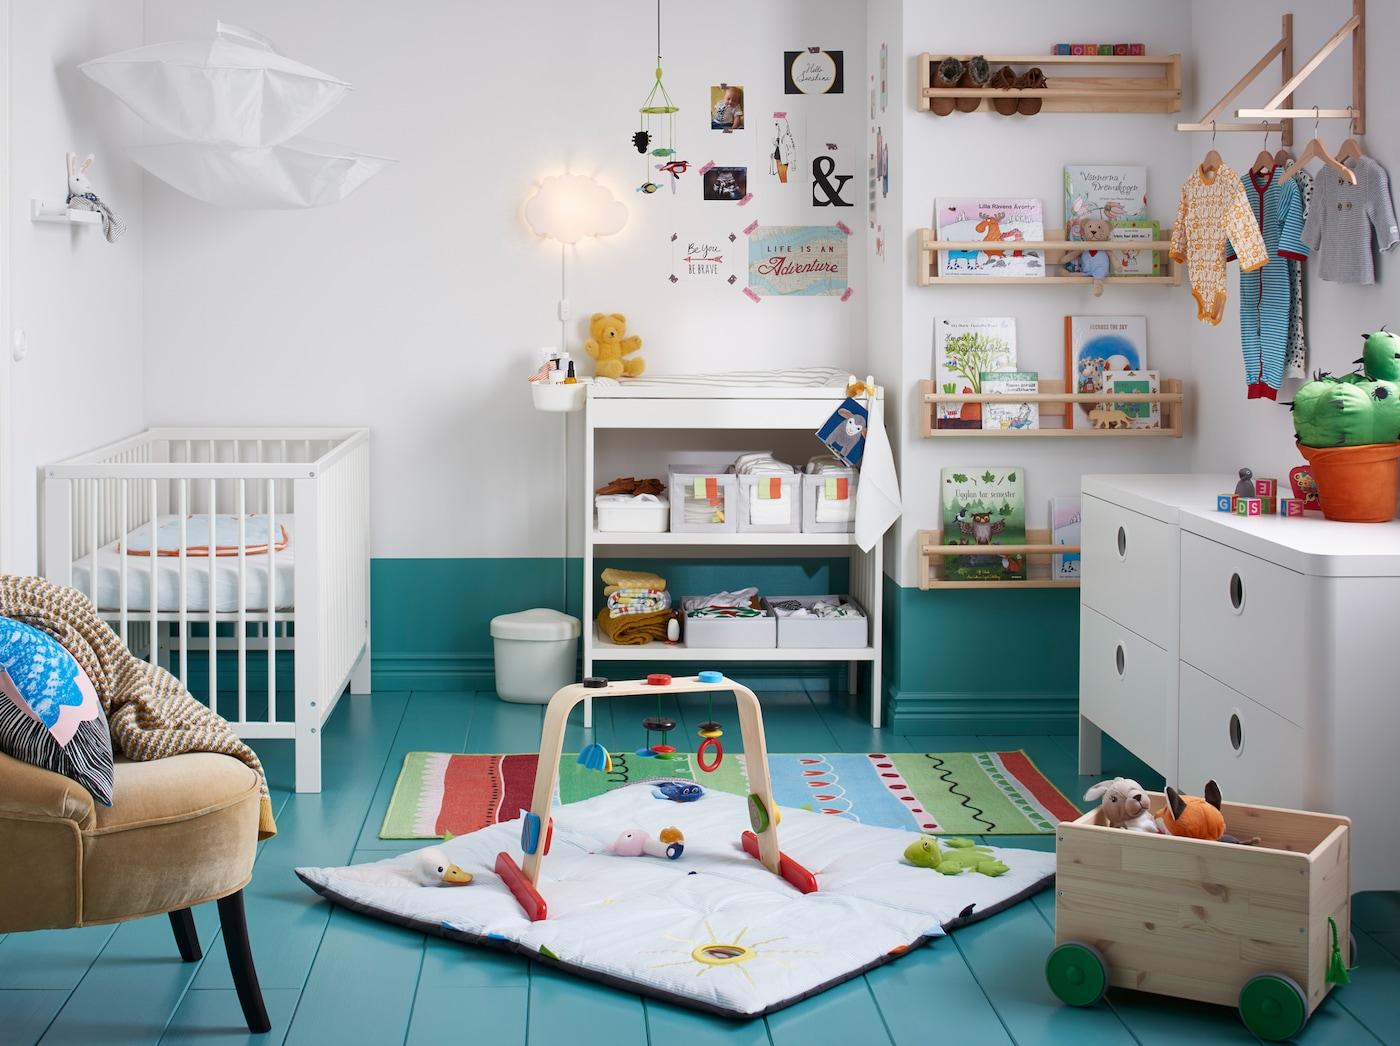 Een babykamer met ledikant, commode, ladekast en speelgoed.